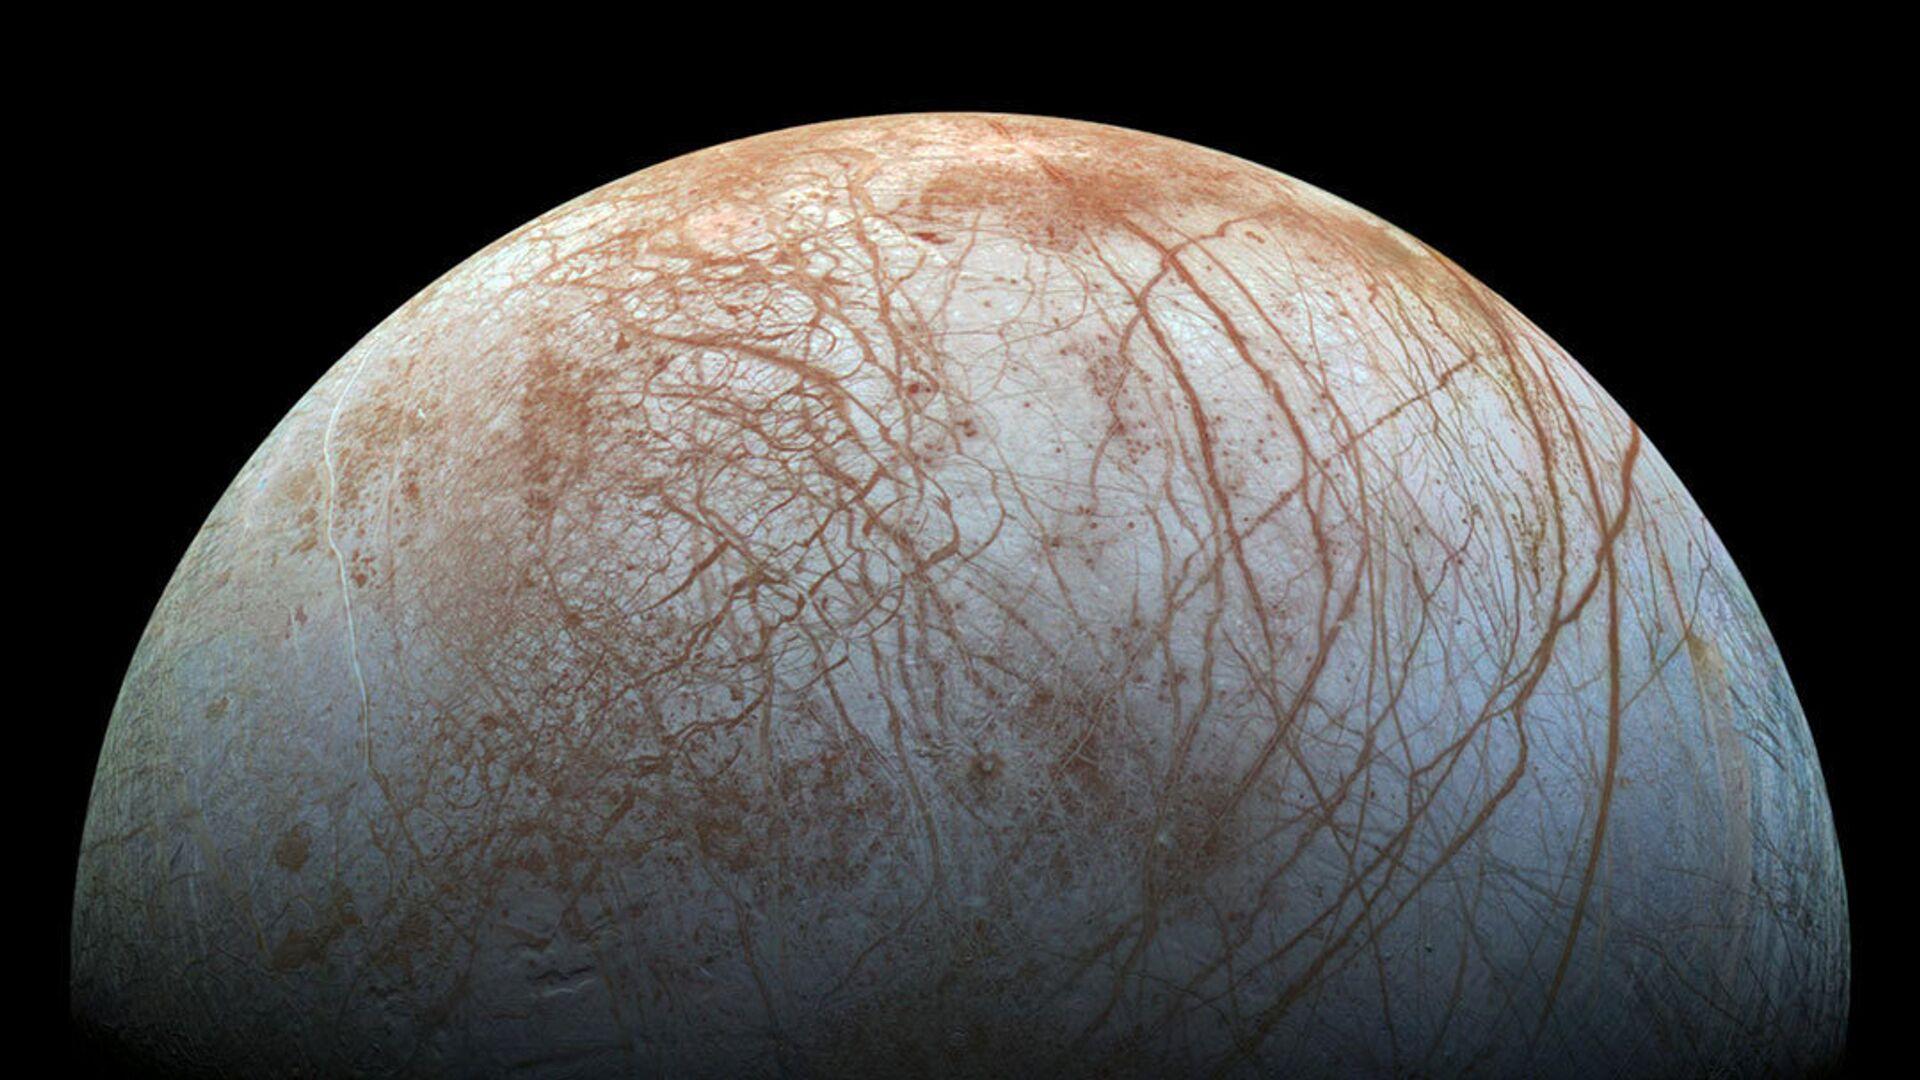 Europa, una de las lunas de Júpiter - Sputnik Mundo, 1920, 27.05.2021